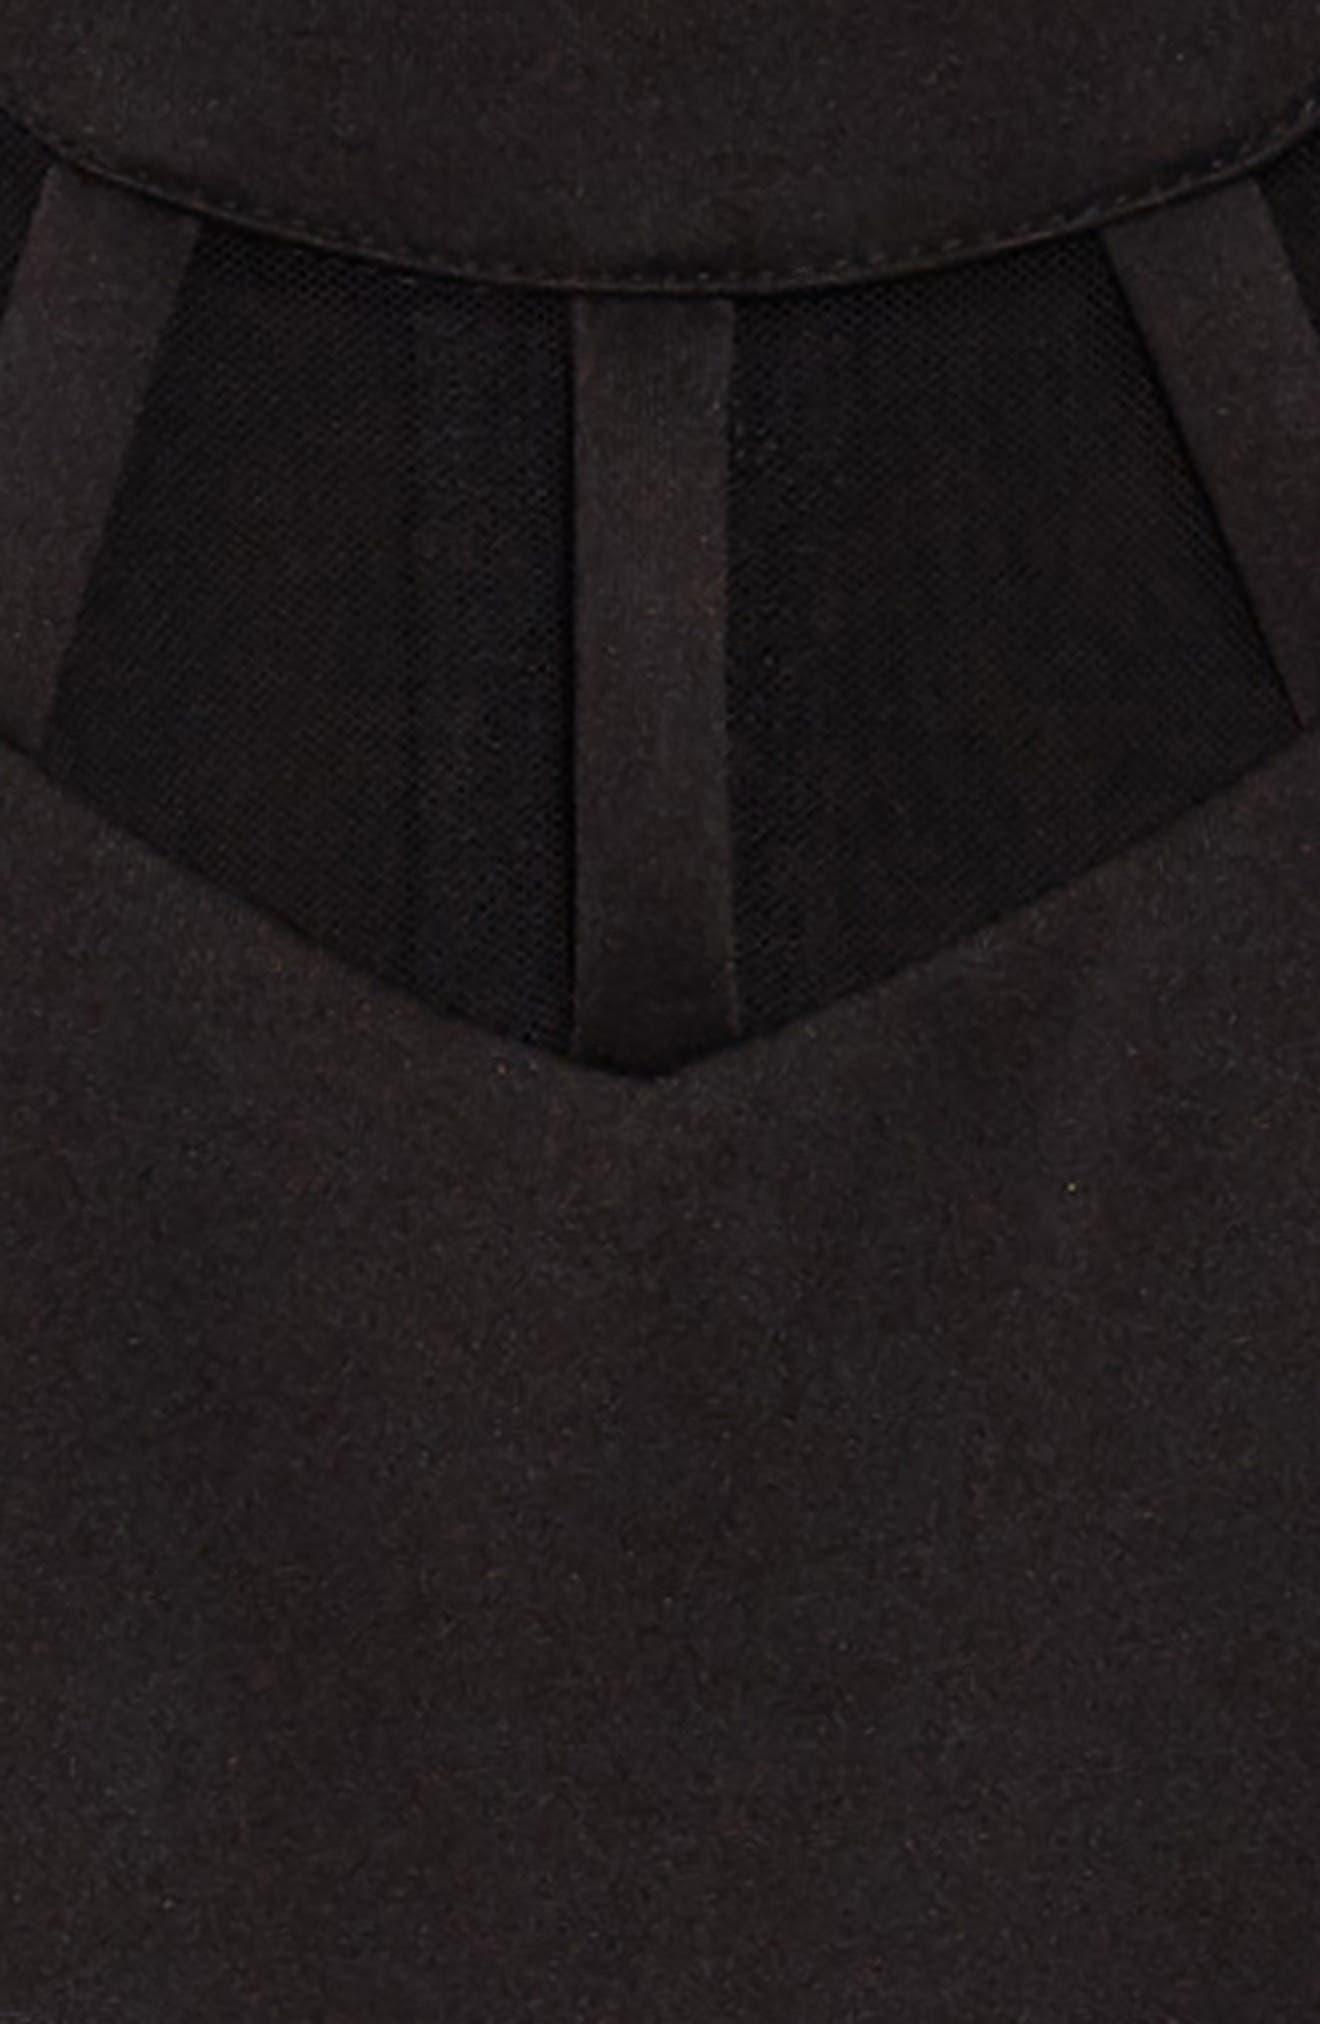 Illusion Neck Skater Dress,                             Alternate thumbnail 3, color,                             Black